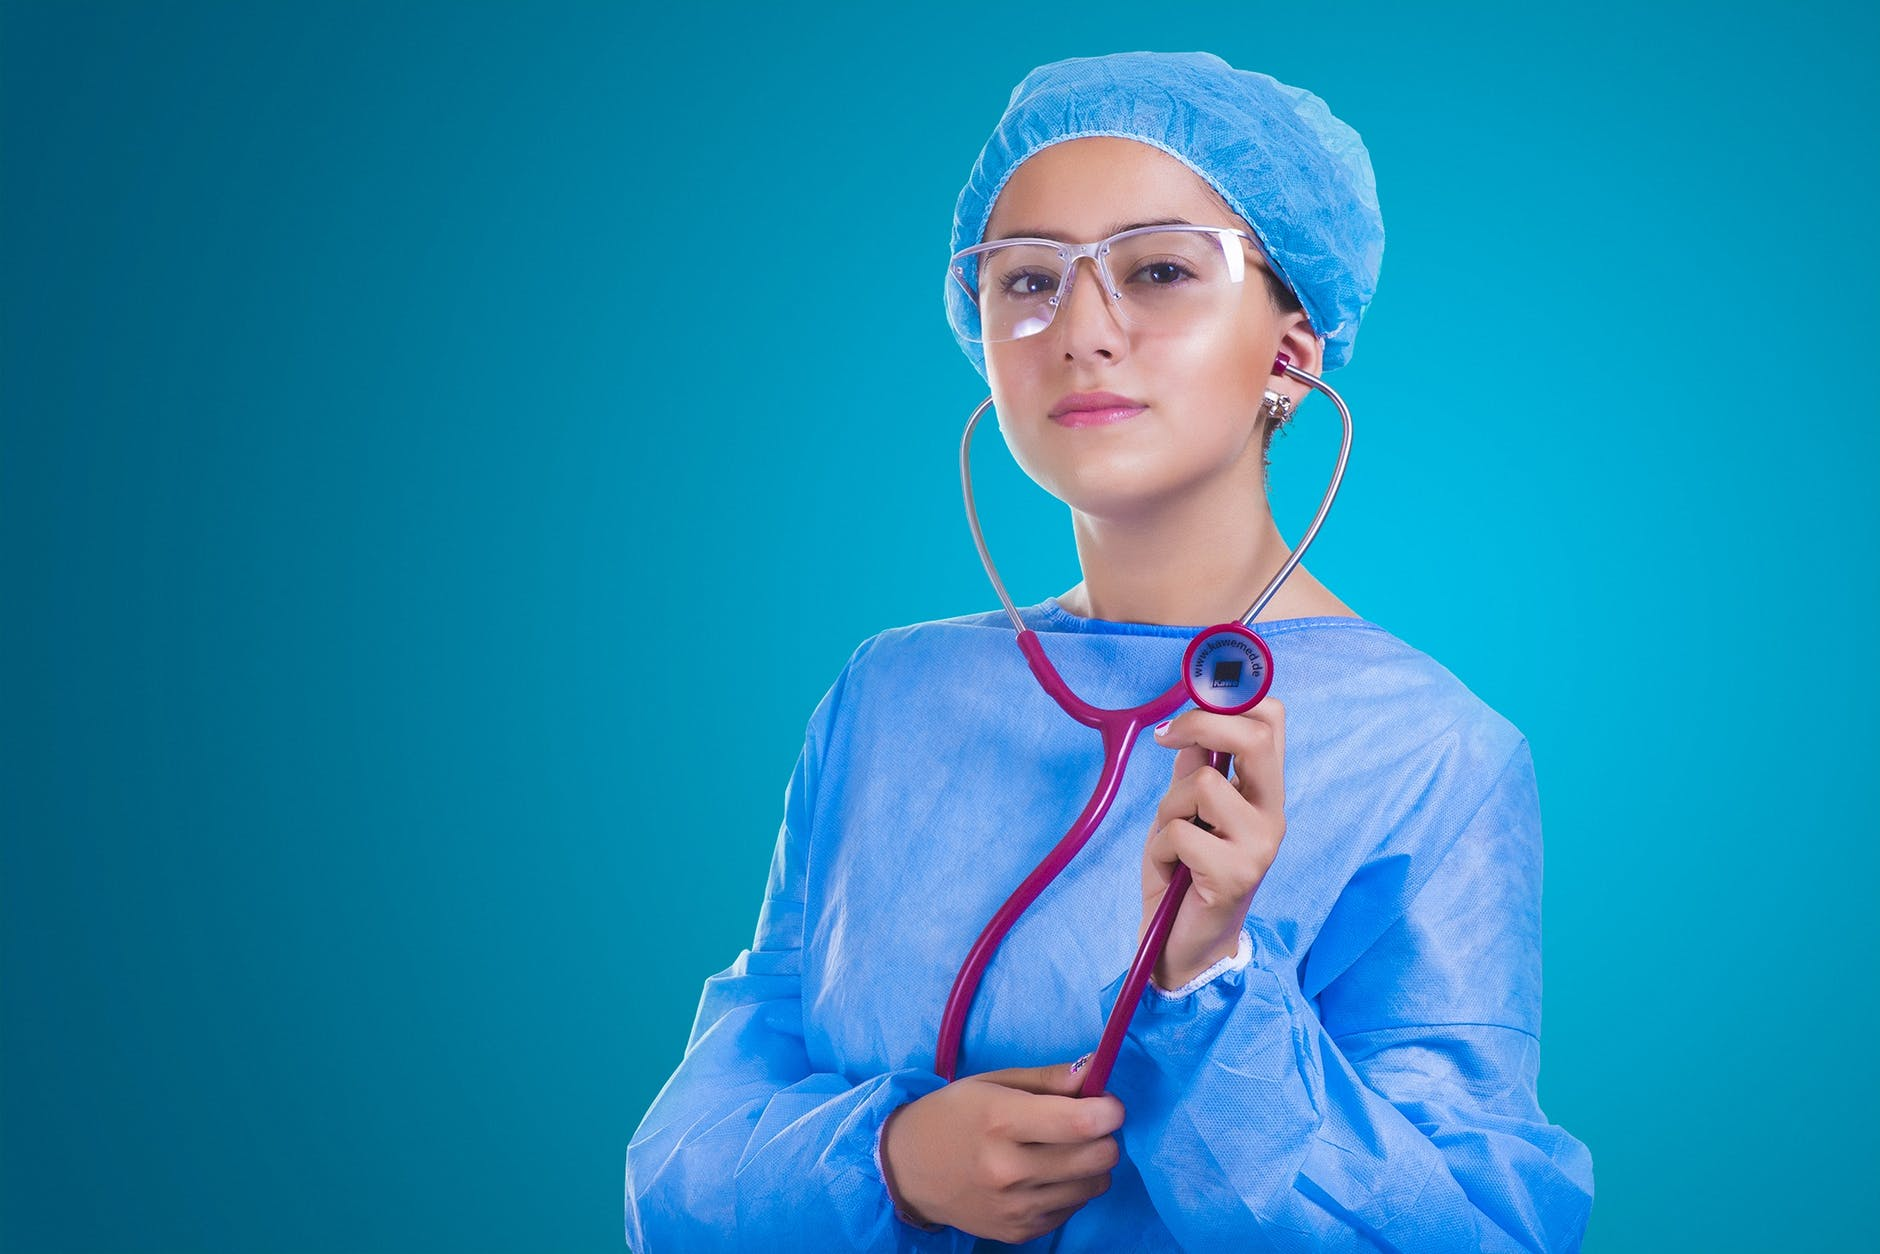 adult doctor girl healthcare